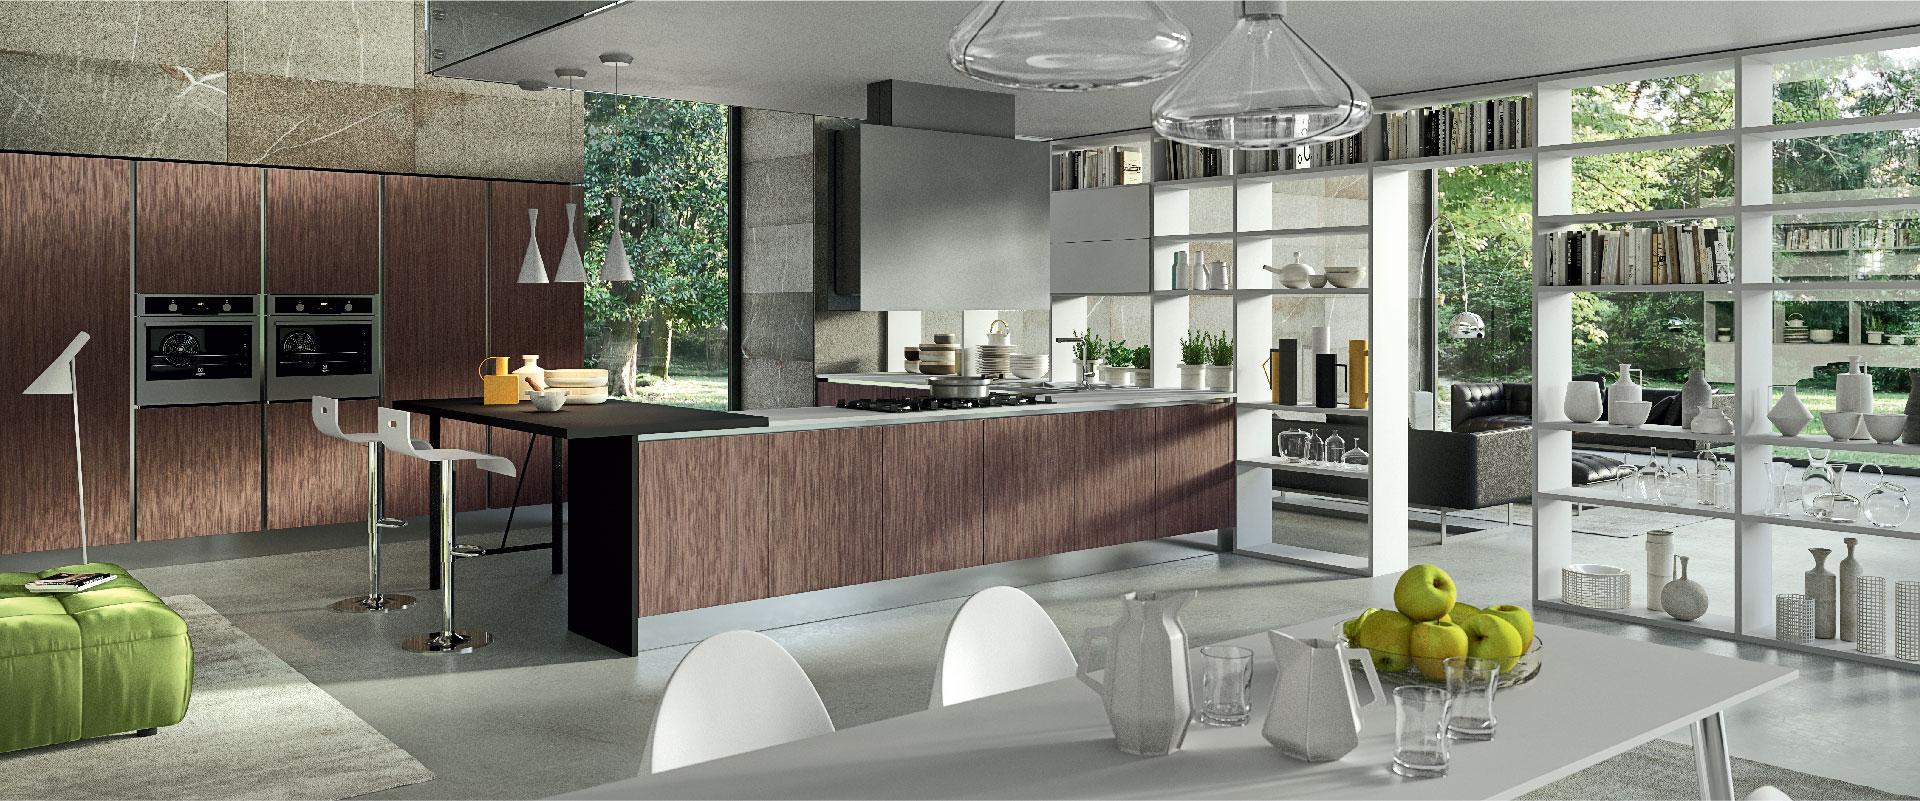 Aran cucine flagship store galbiati arreda for Galbiati arreda